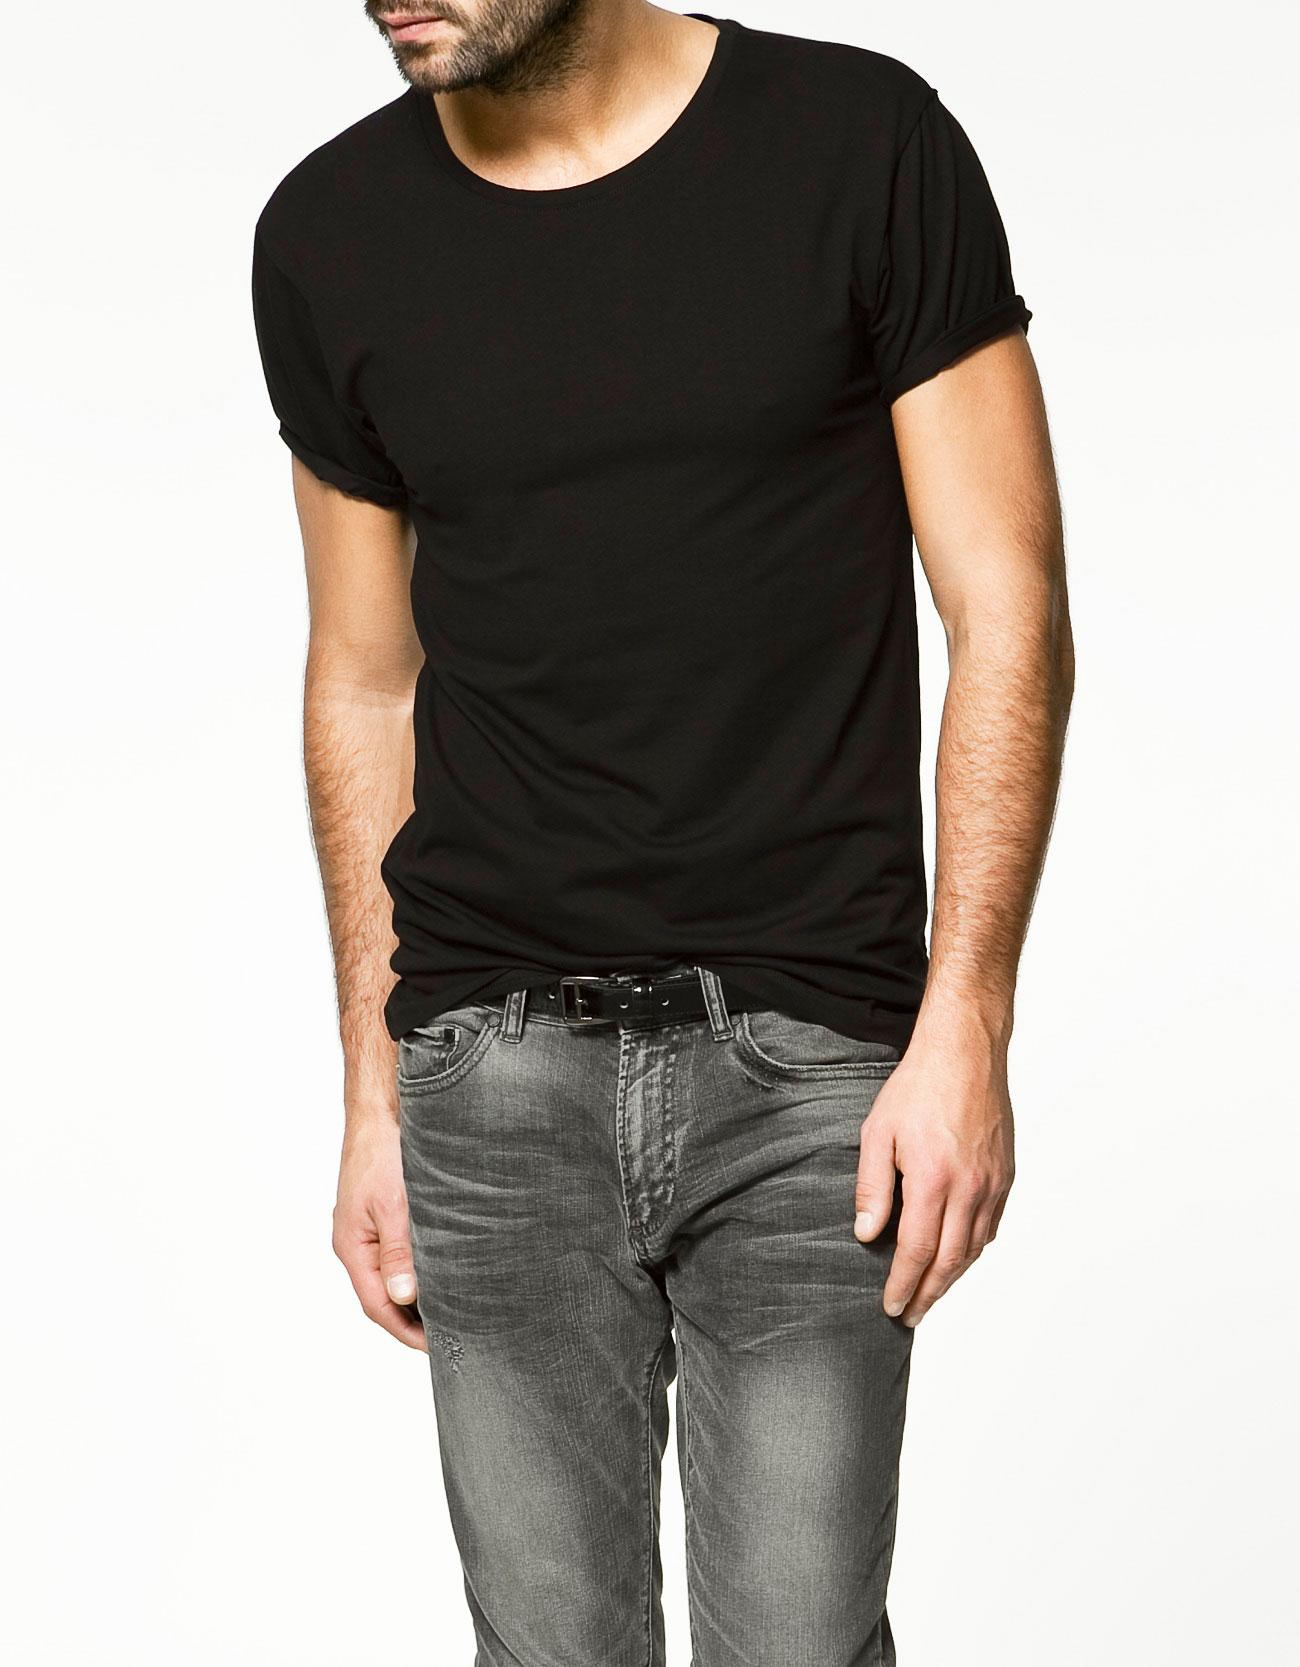 Zara Slim Fit T Shirt In Black For Men Lyst